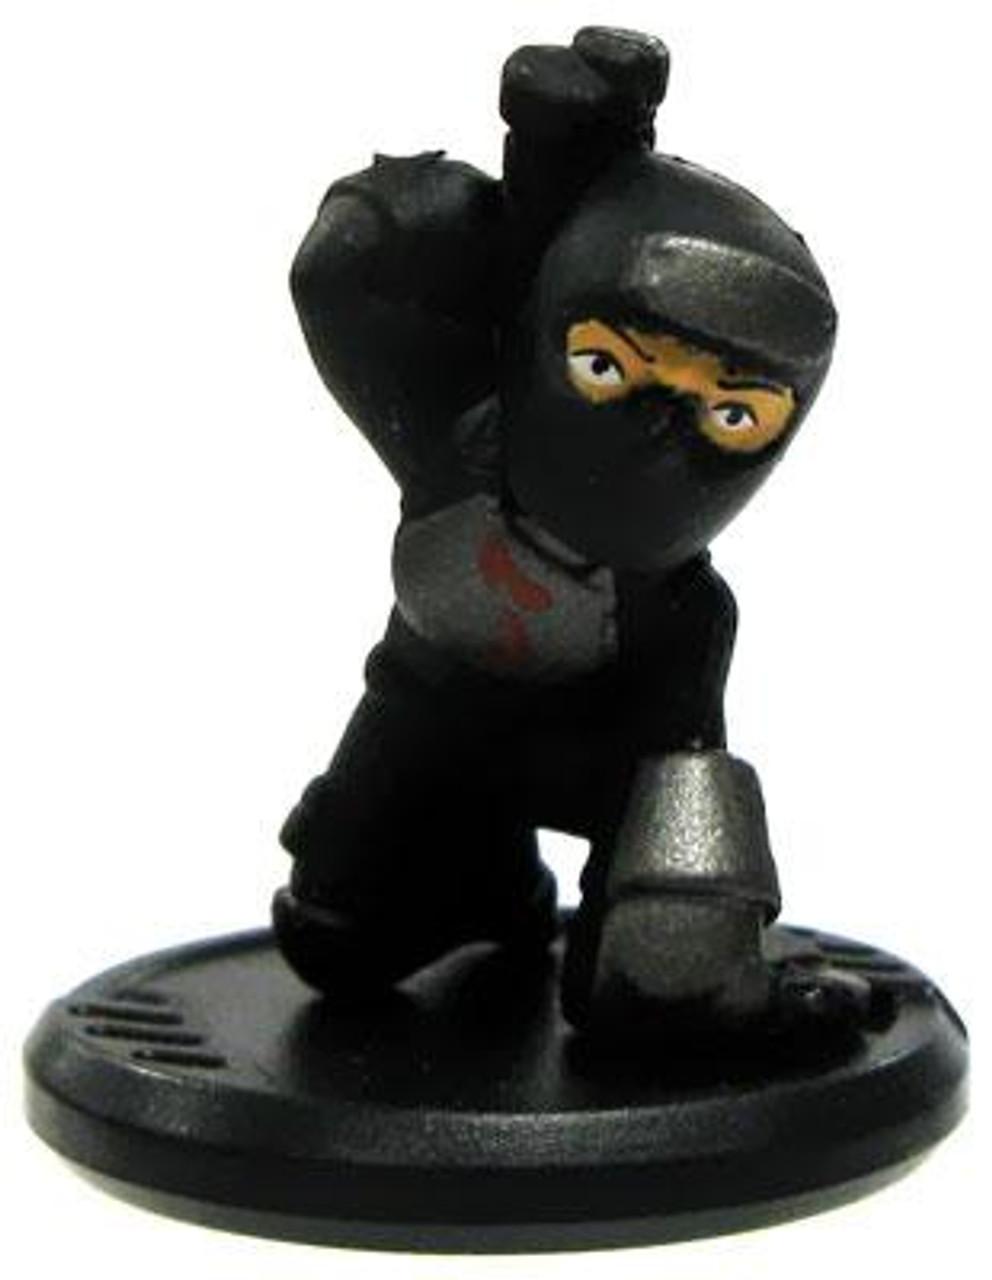 GI Joe Micro Force Series 1 Dark Ninja Brawler S1-39